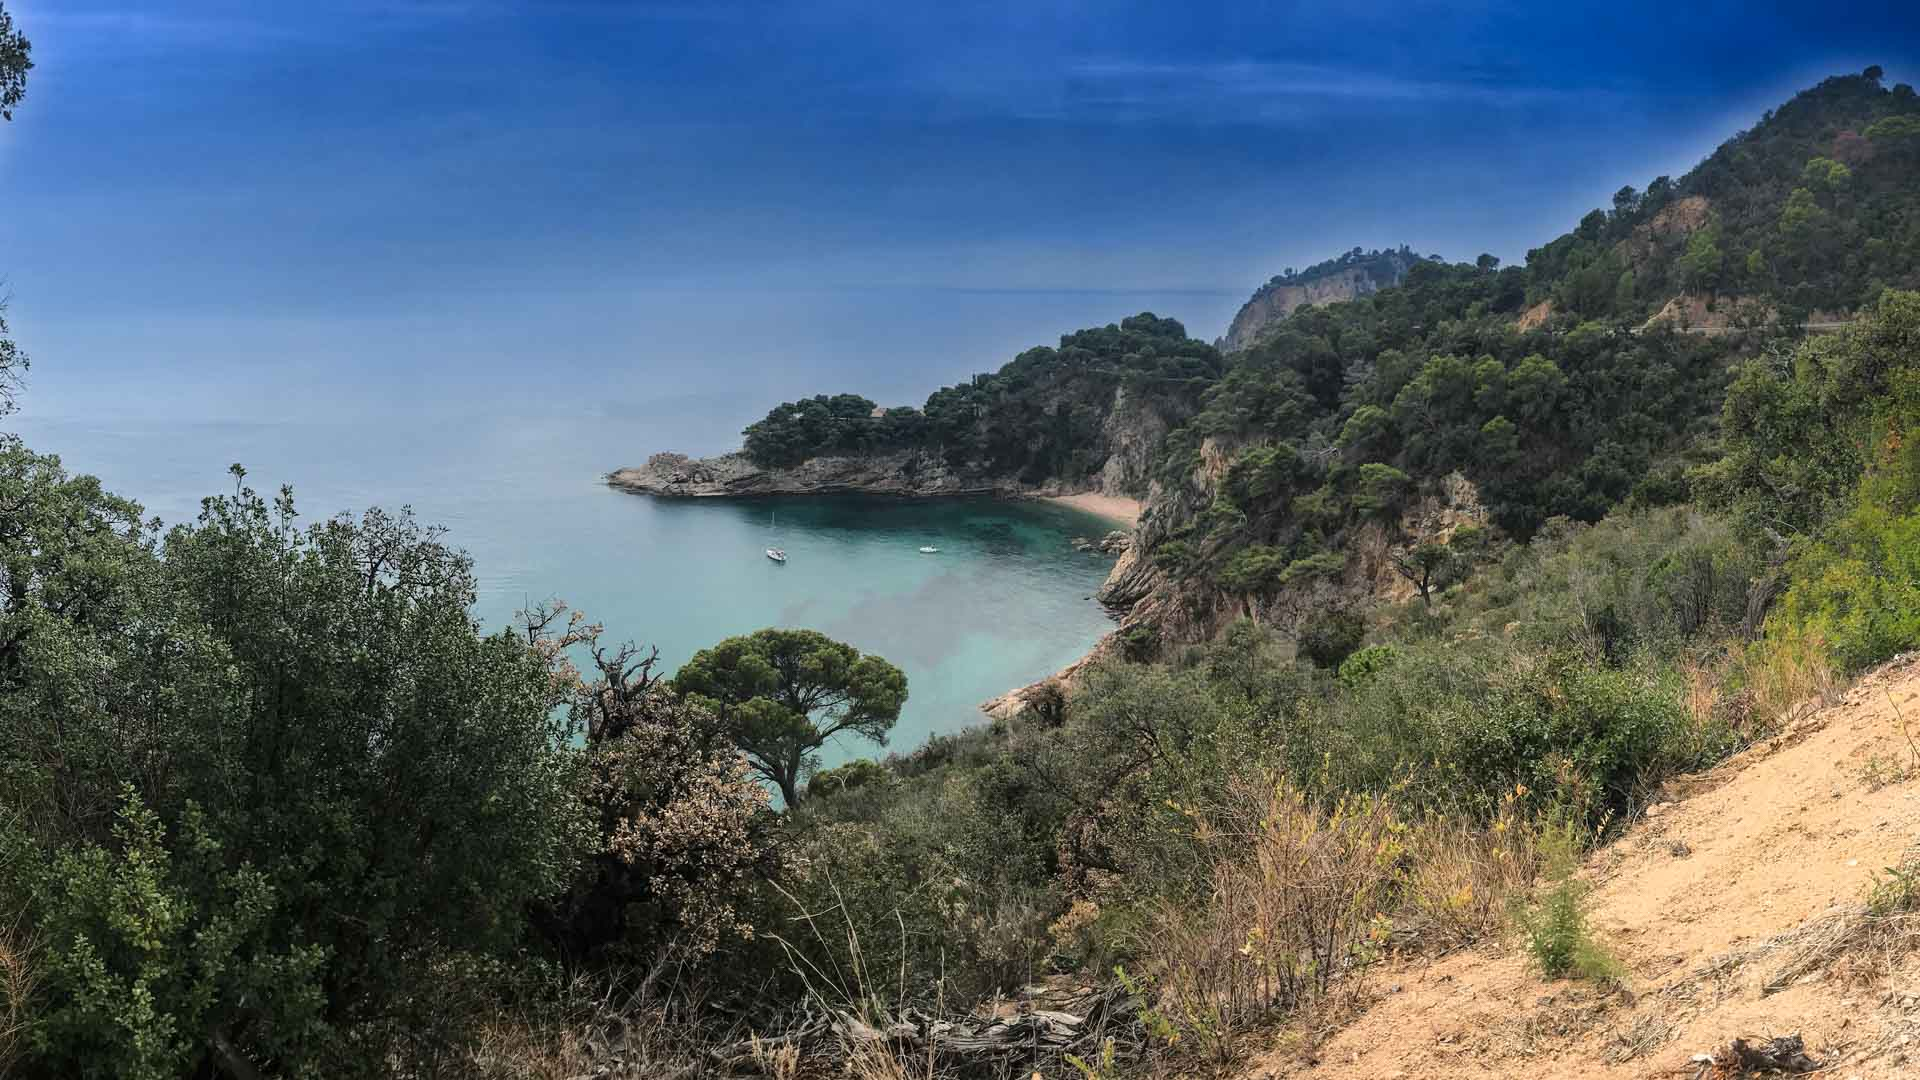 Guide To Cycling Costa Brava Coastline And Sant Grau Epic Road Rides